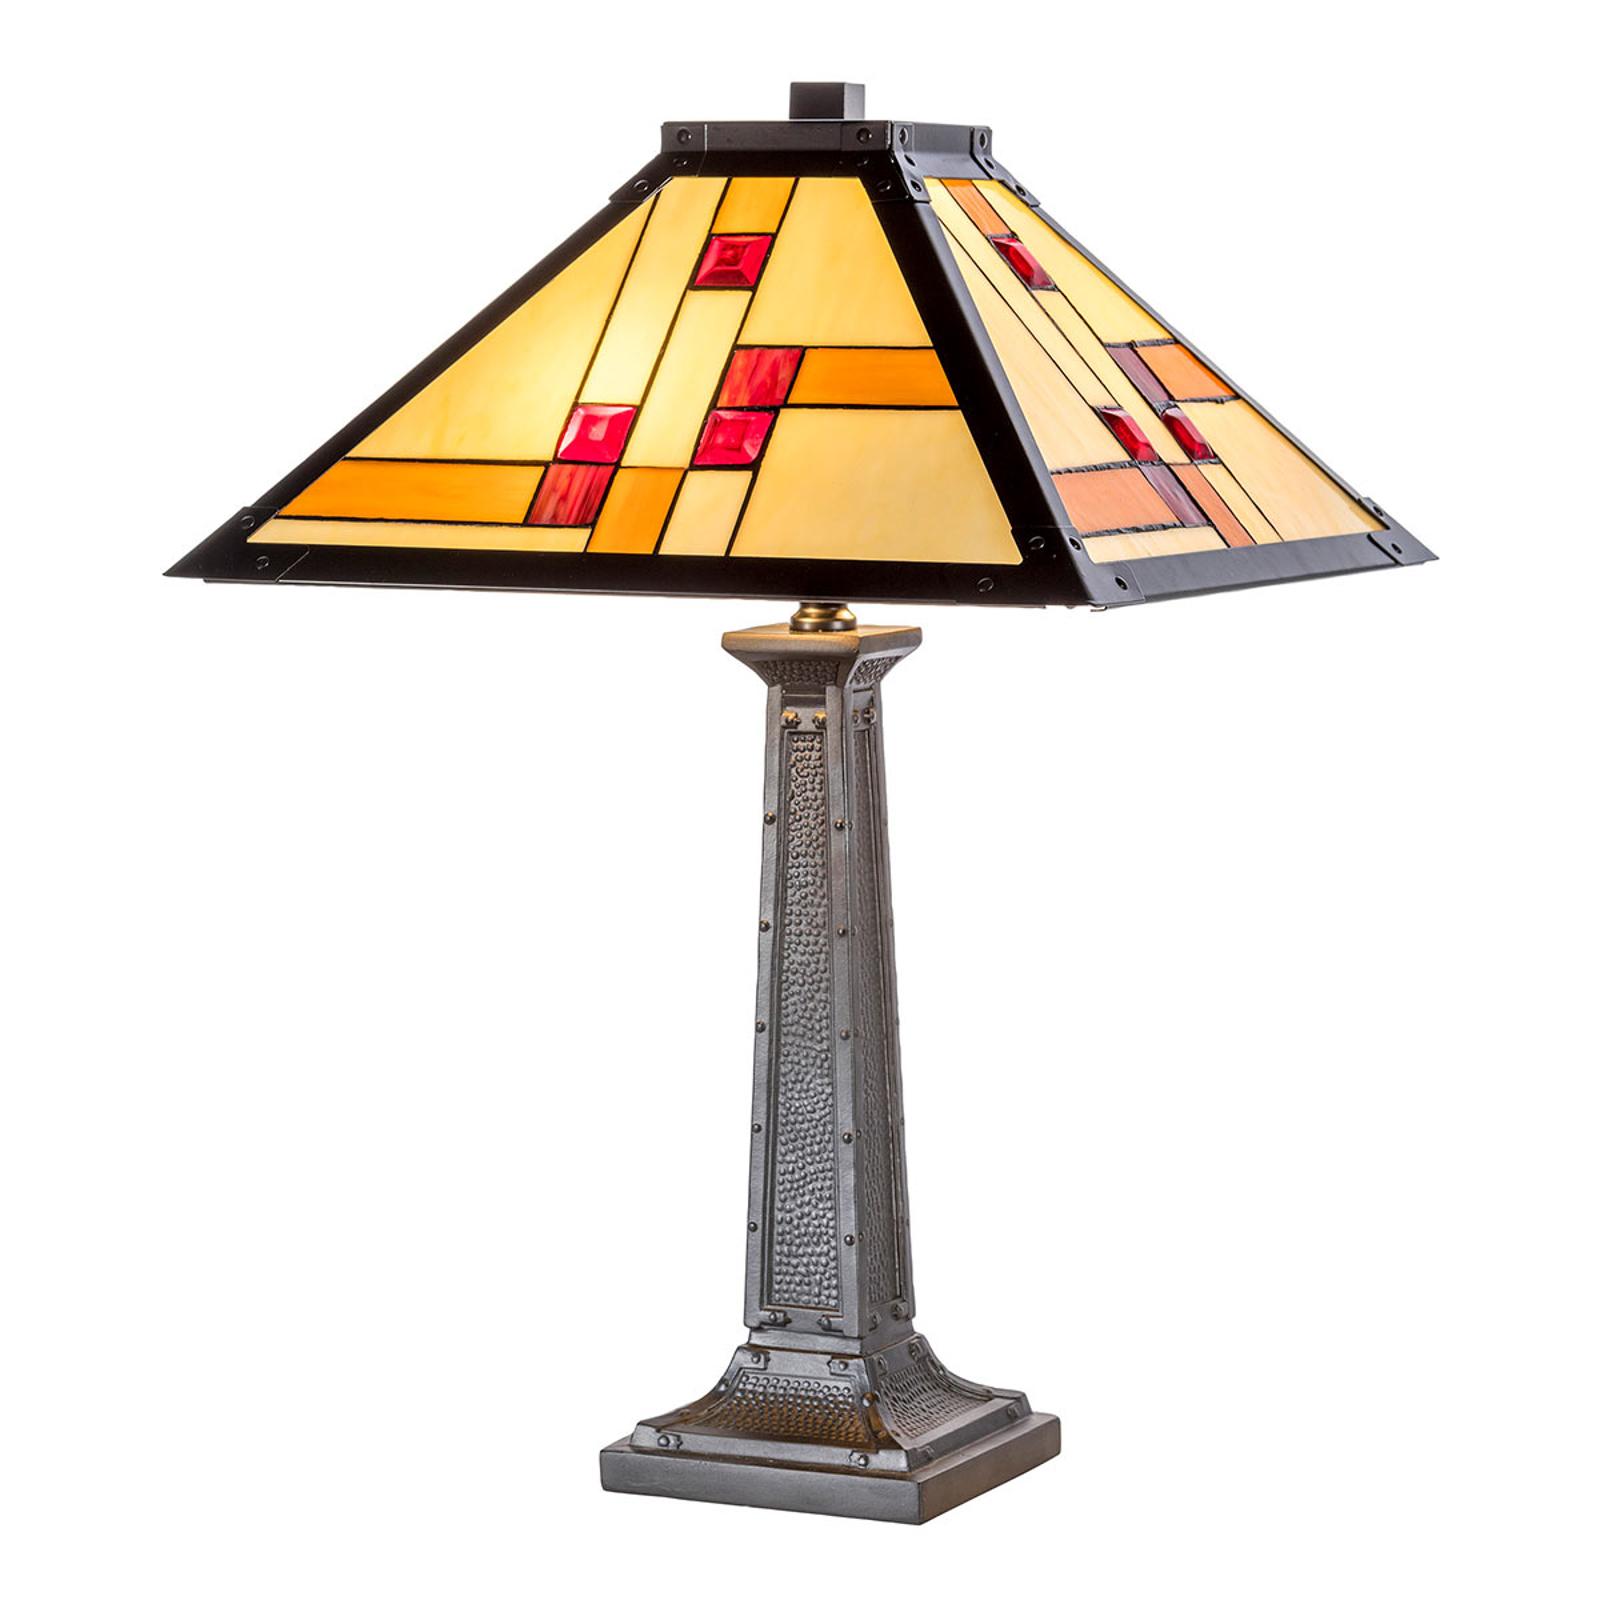 Bordslampa KT1836-40+P1836 i Tiffany-stil